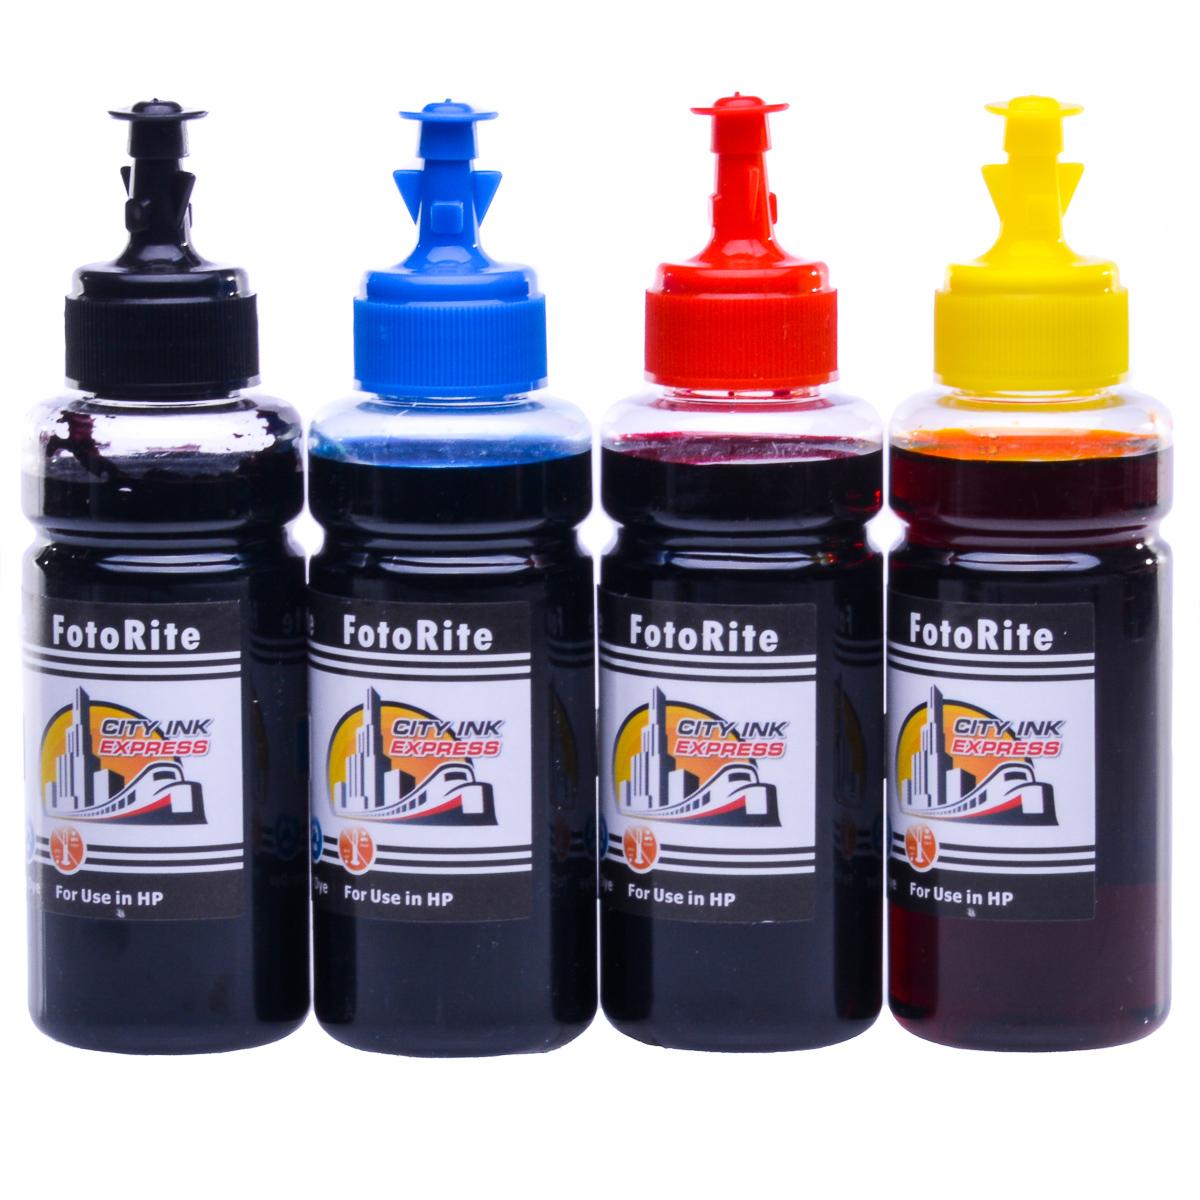 Cheap Multipack dye ink refill replaces HP Officejet Officejet 4610